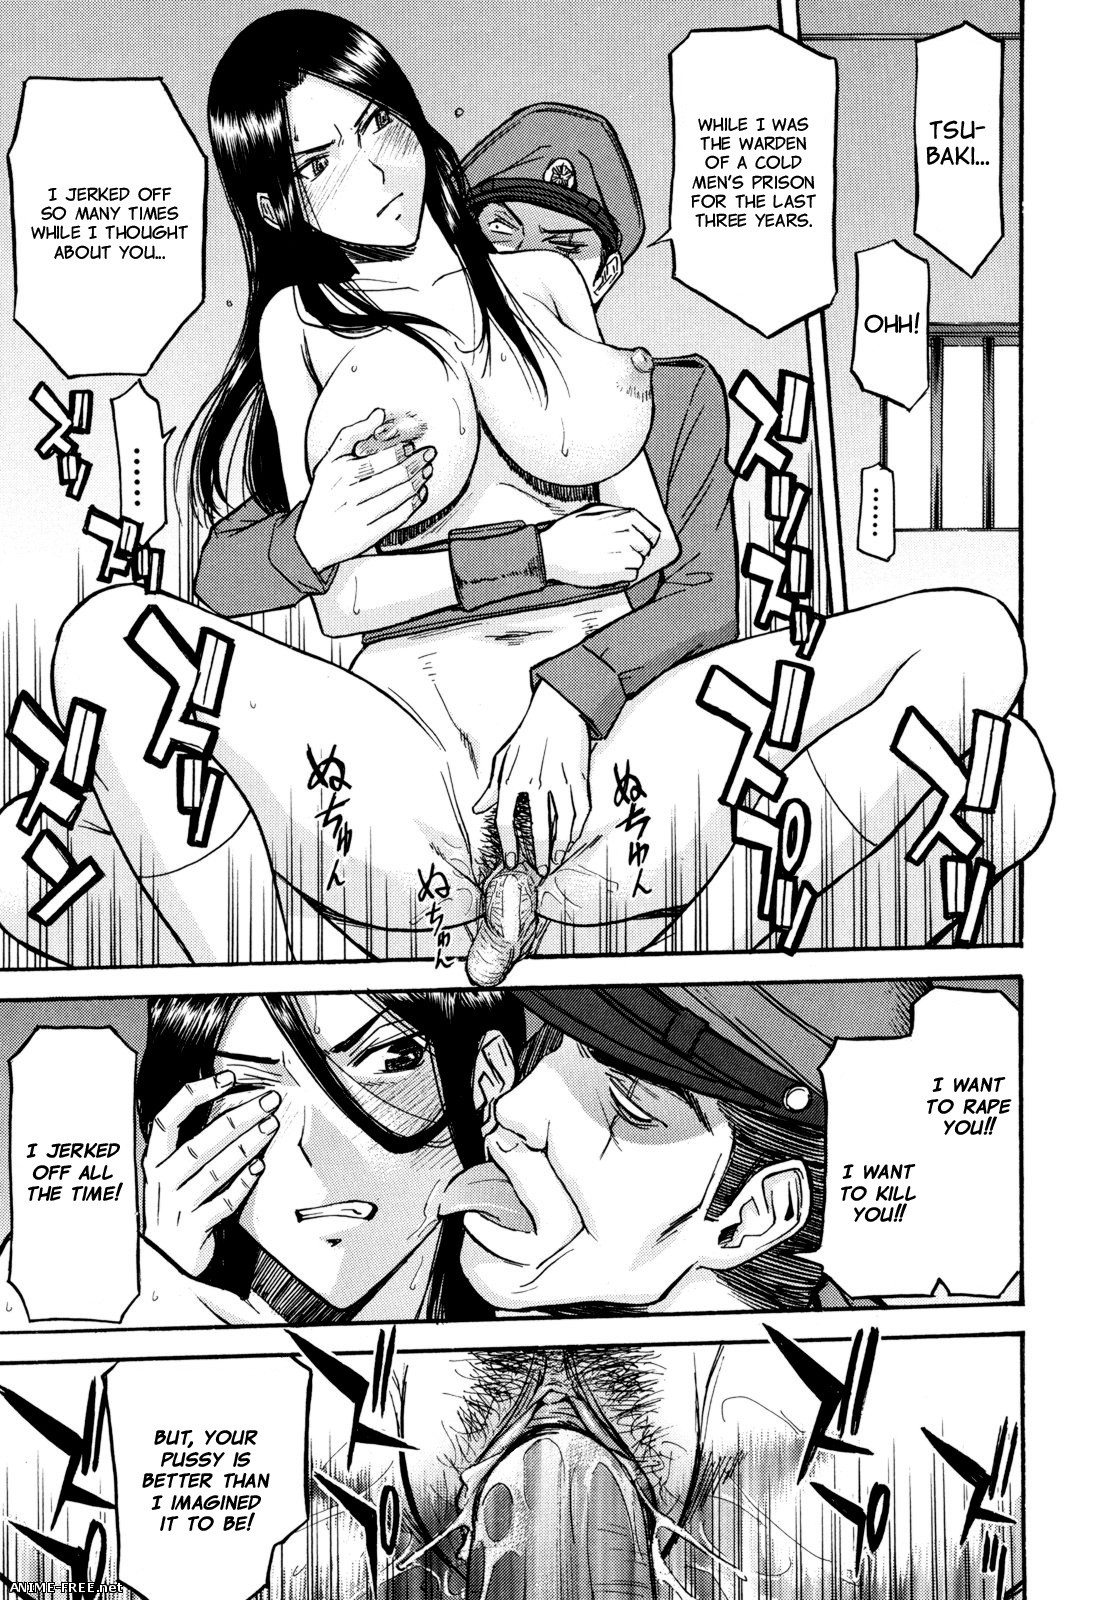 [Inomaru] - High Thrust - Коллекция манги [PtCen] [ENG,JAP,RUS] Manga Hentai